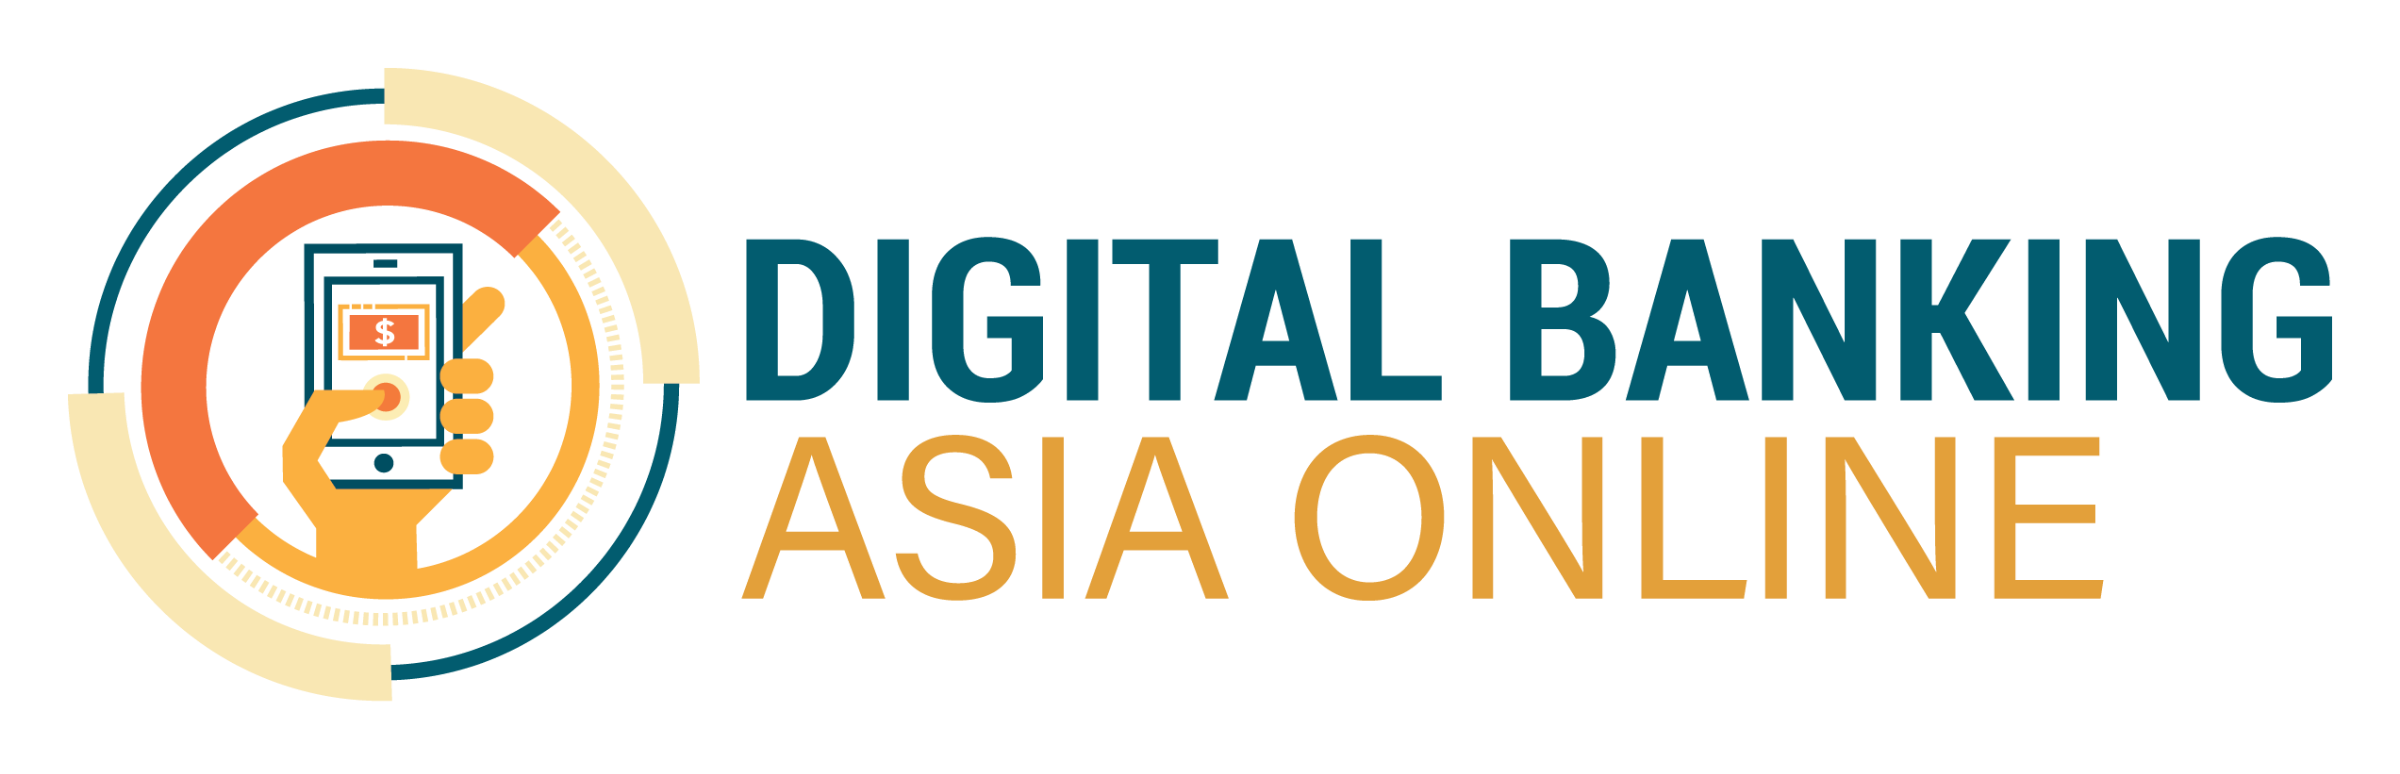 Digital Banking Asia Online